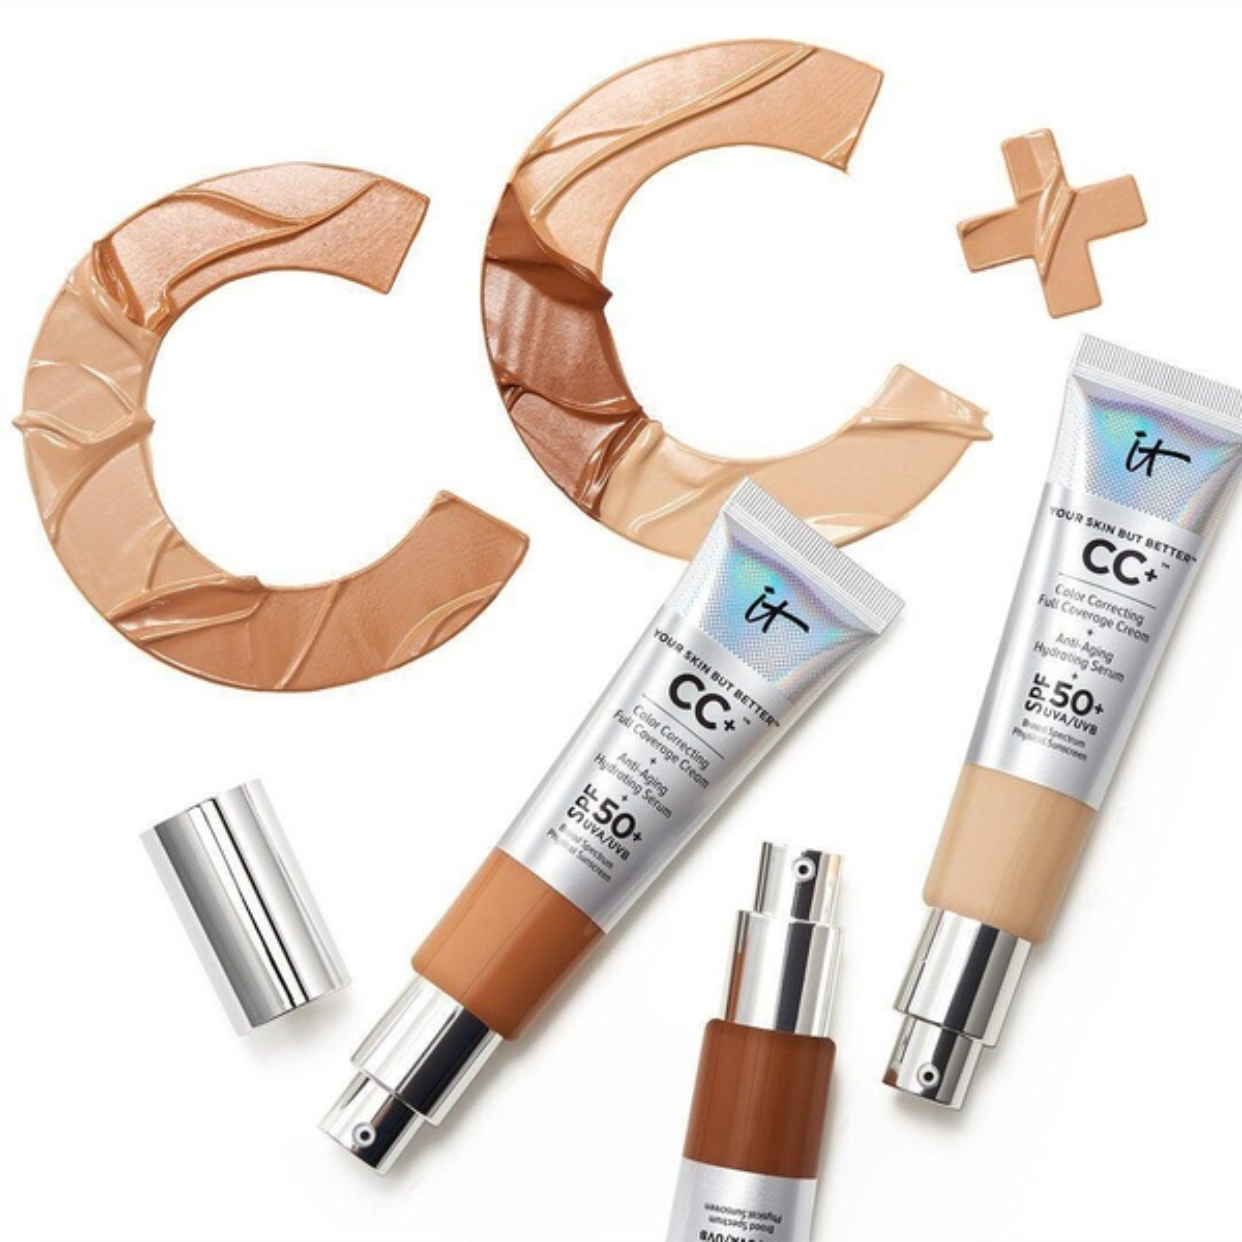 Face Concealer It Cosmetics CC+ Cream SPF50 Full Cover Medium Light Base Liquid Foundation Makeup Whitening Your Skin But Better